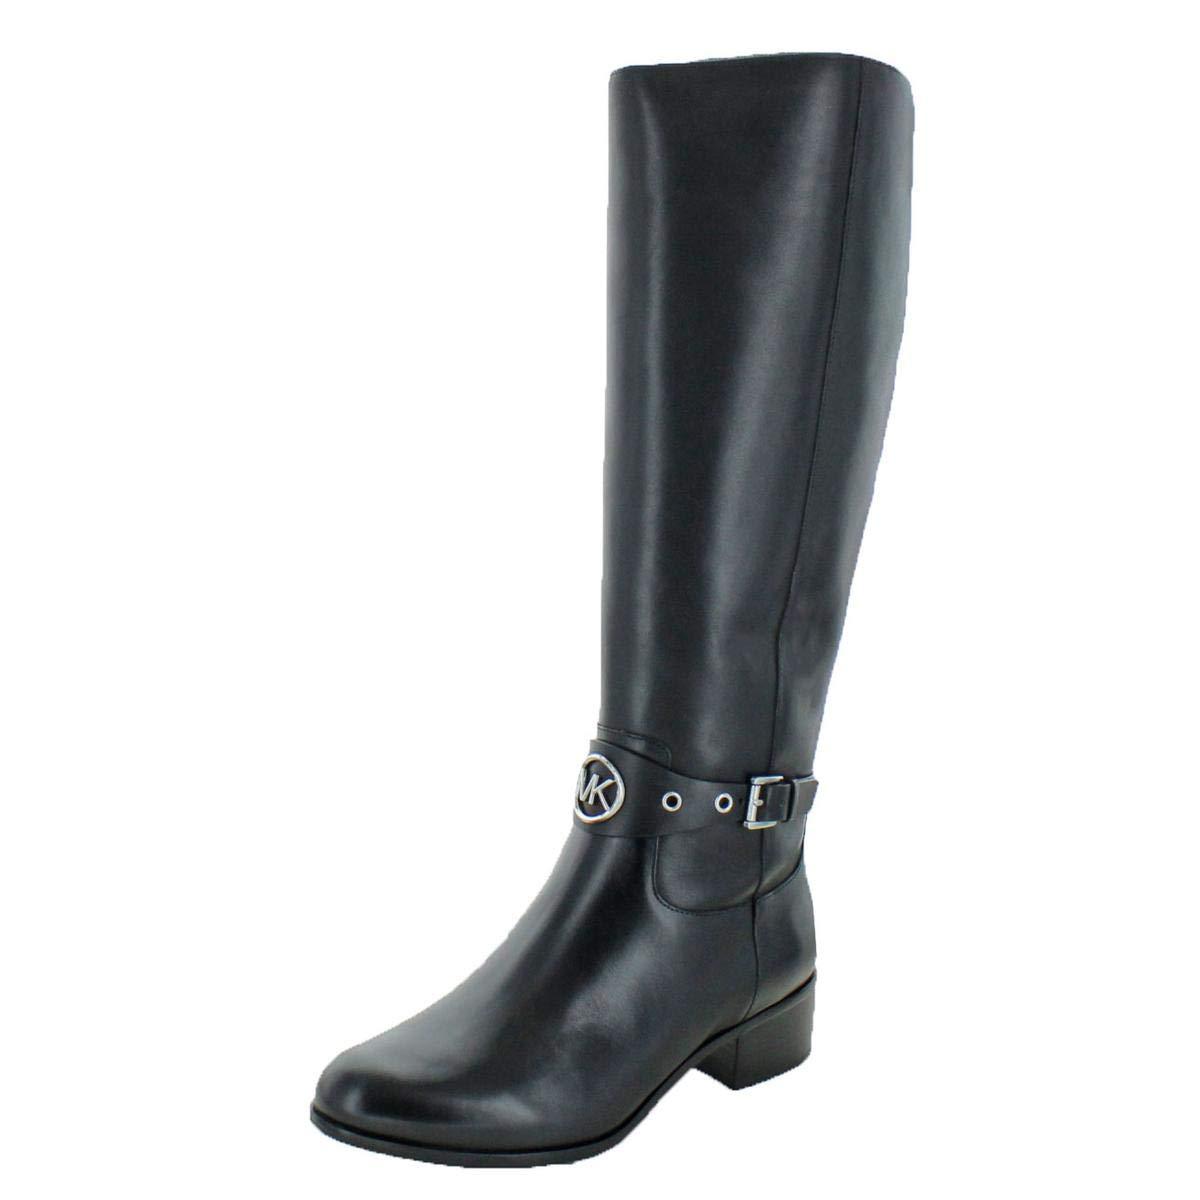 4e72469a2ea Amazon.com | Michael Michael Kors Womens Heather Leather Closed Toe Knee,  Black, Size 11.0 | Shoes